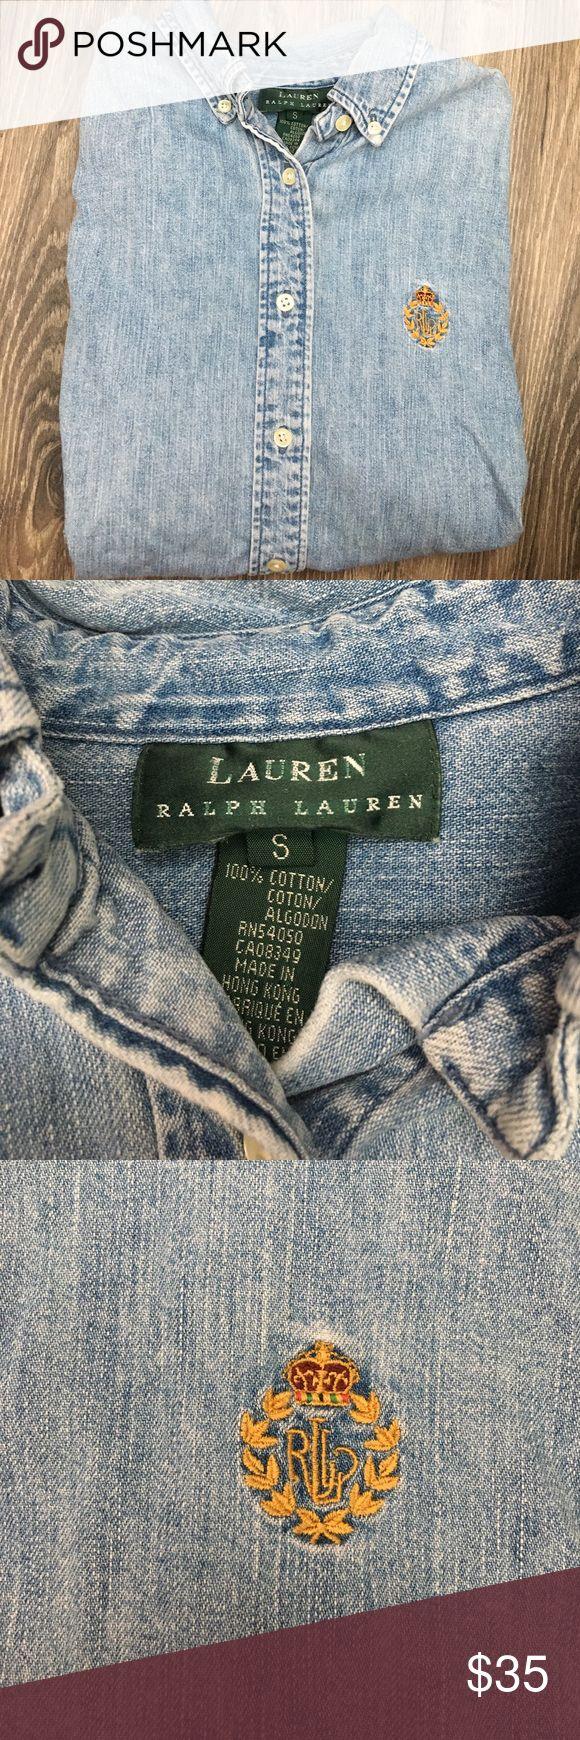 Vintage Ralph Lauren Denim Button-up Vintage Ralph Lauren woman's denim button-up shirt with embroidered logo. Size woman's small but runs a little bigger. In great condition! Ralph Lauren Tops Button Down Shirts